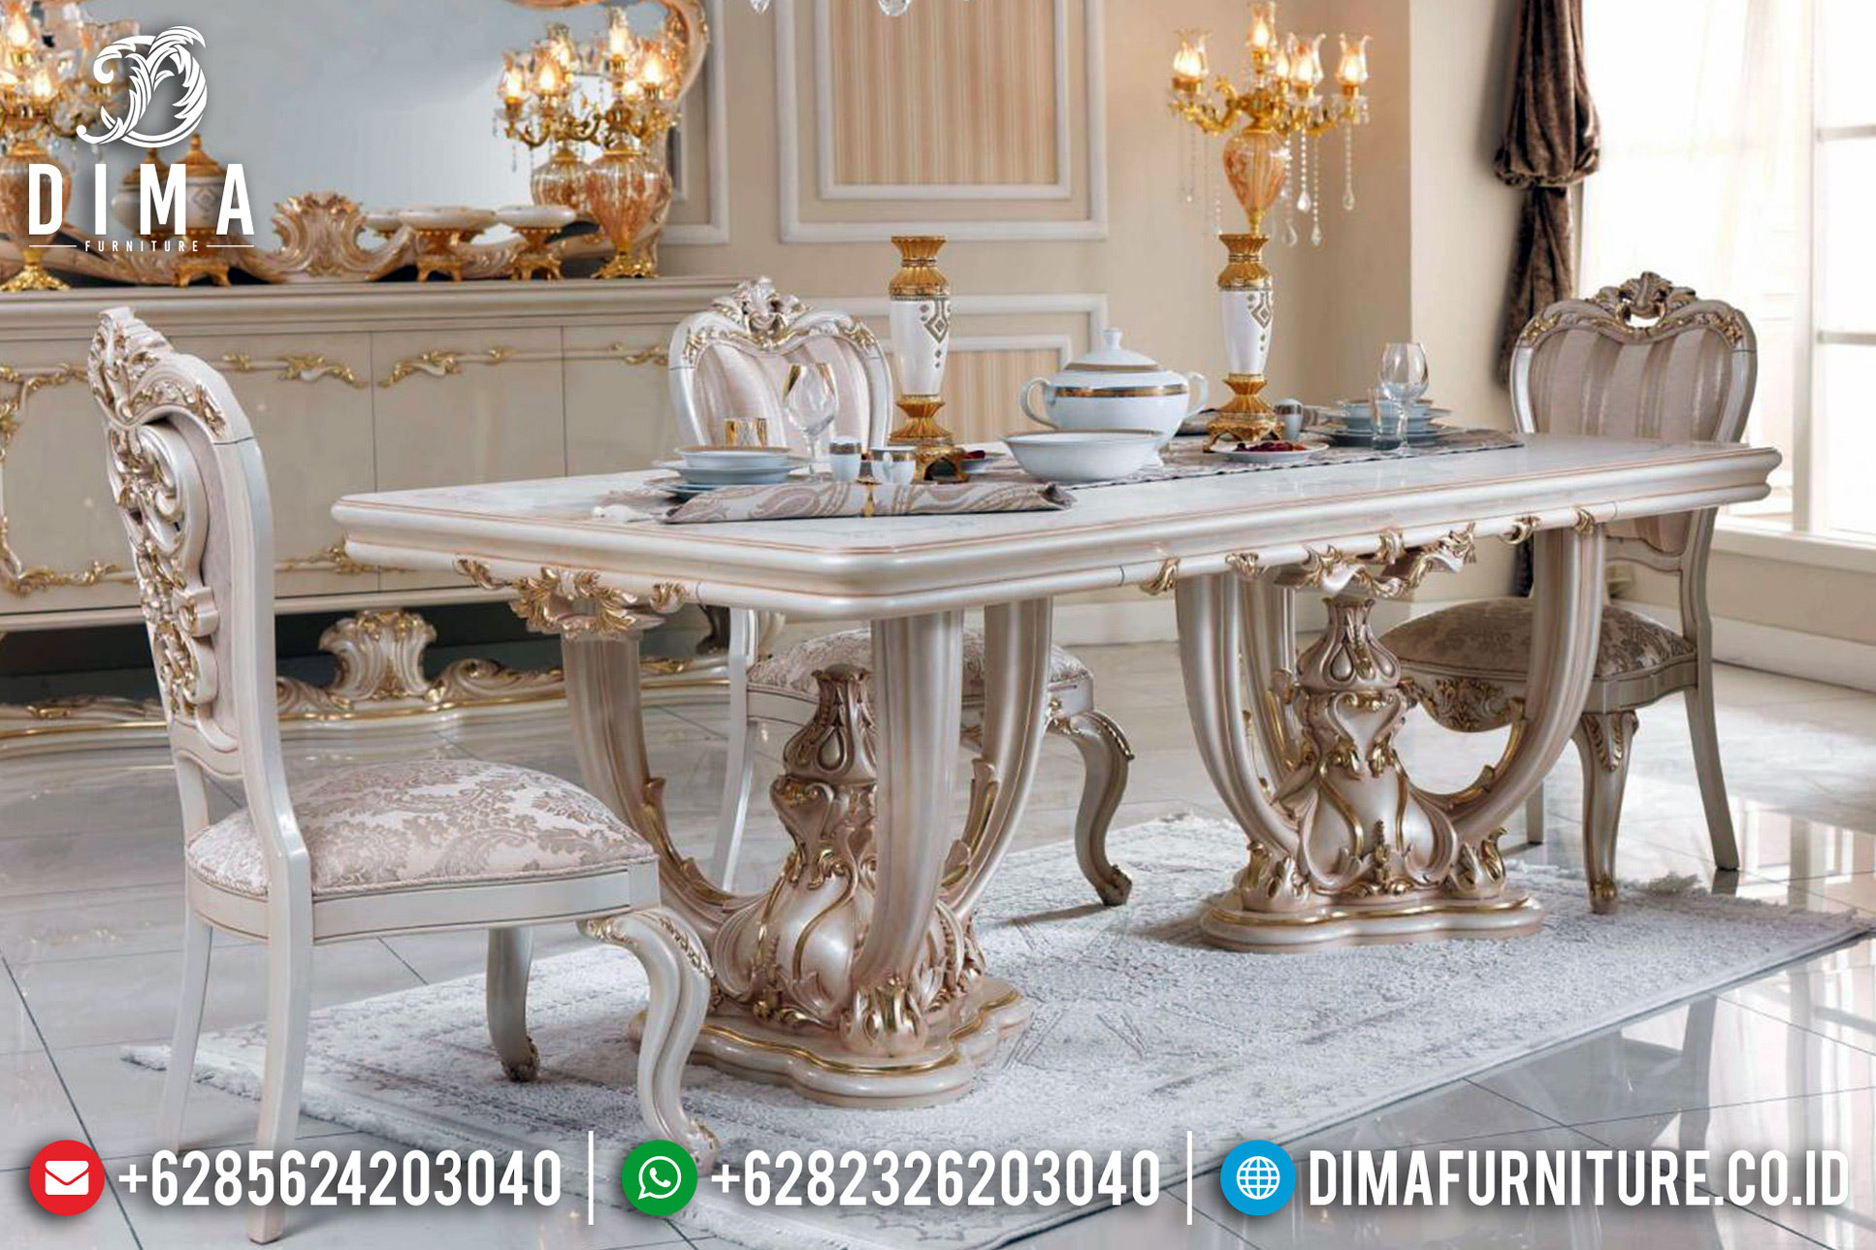 New Model Meja Makan Ukiran Mewah Klasik Superior Luxury White Duco TTJ-0740